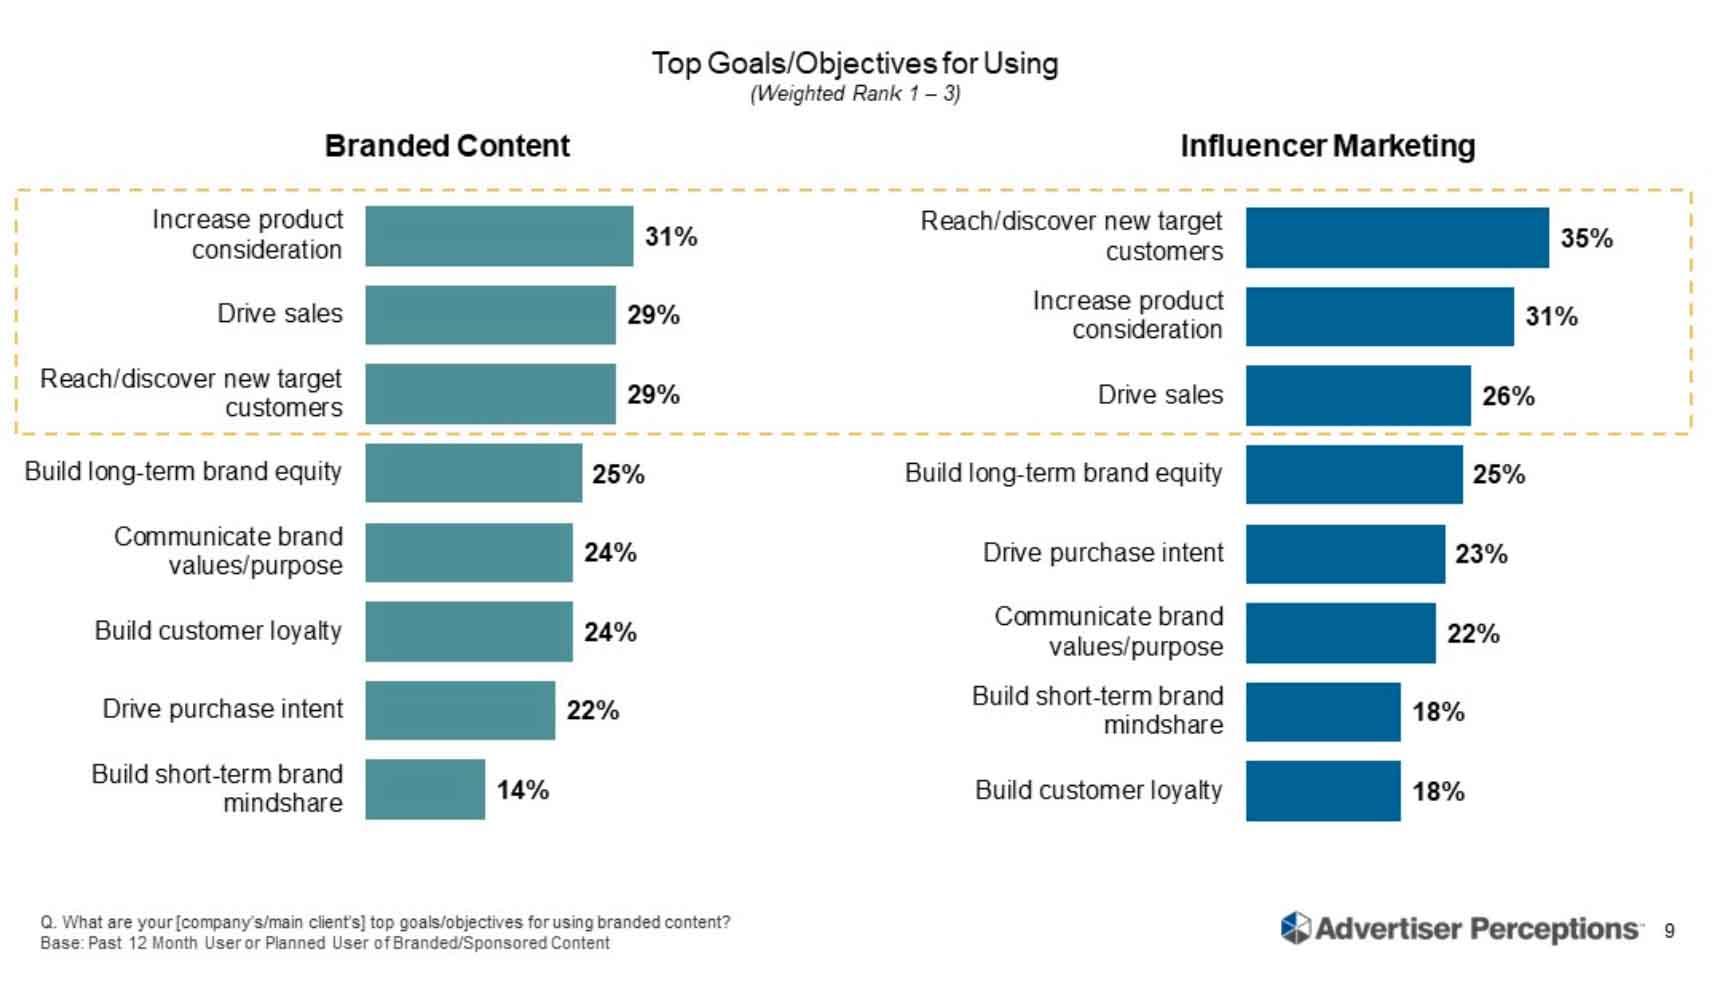 Top goals for influencer marketing